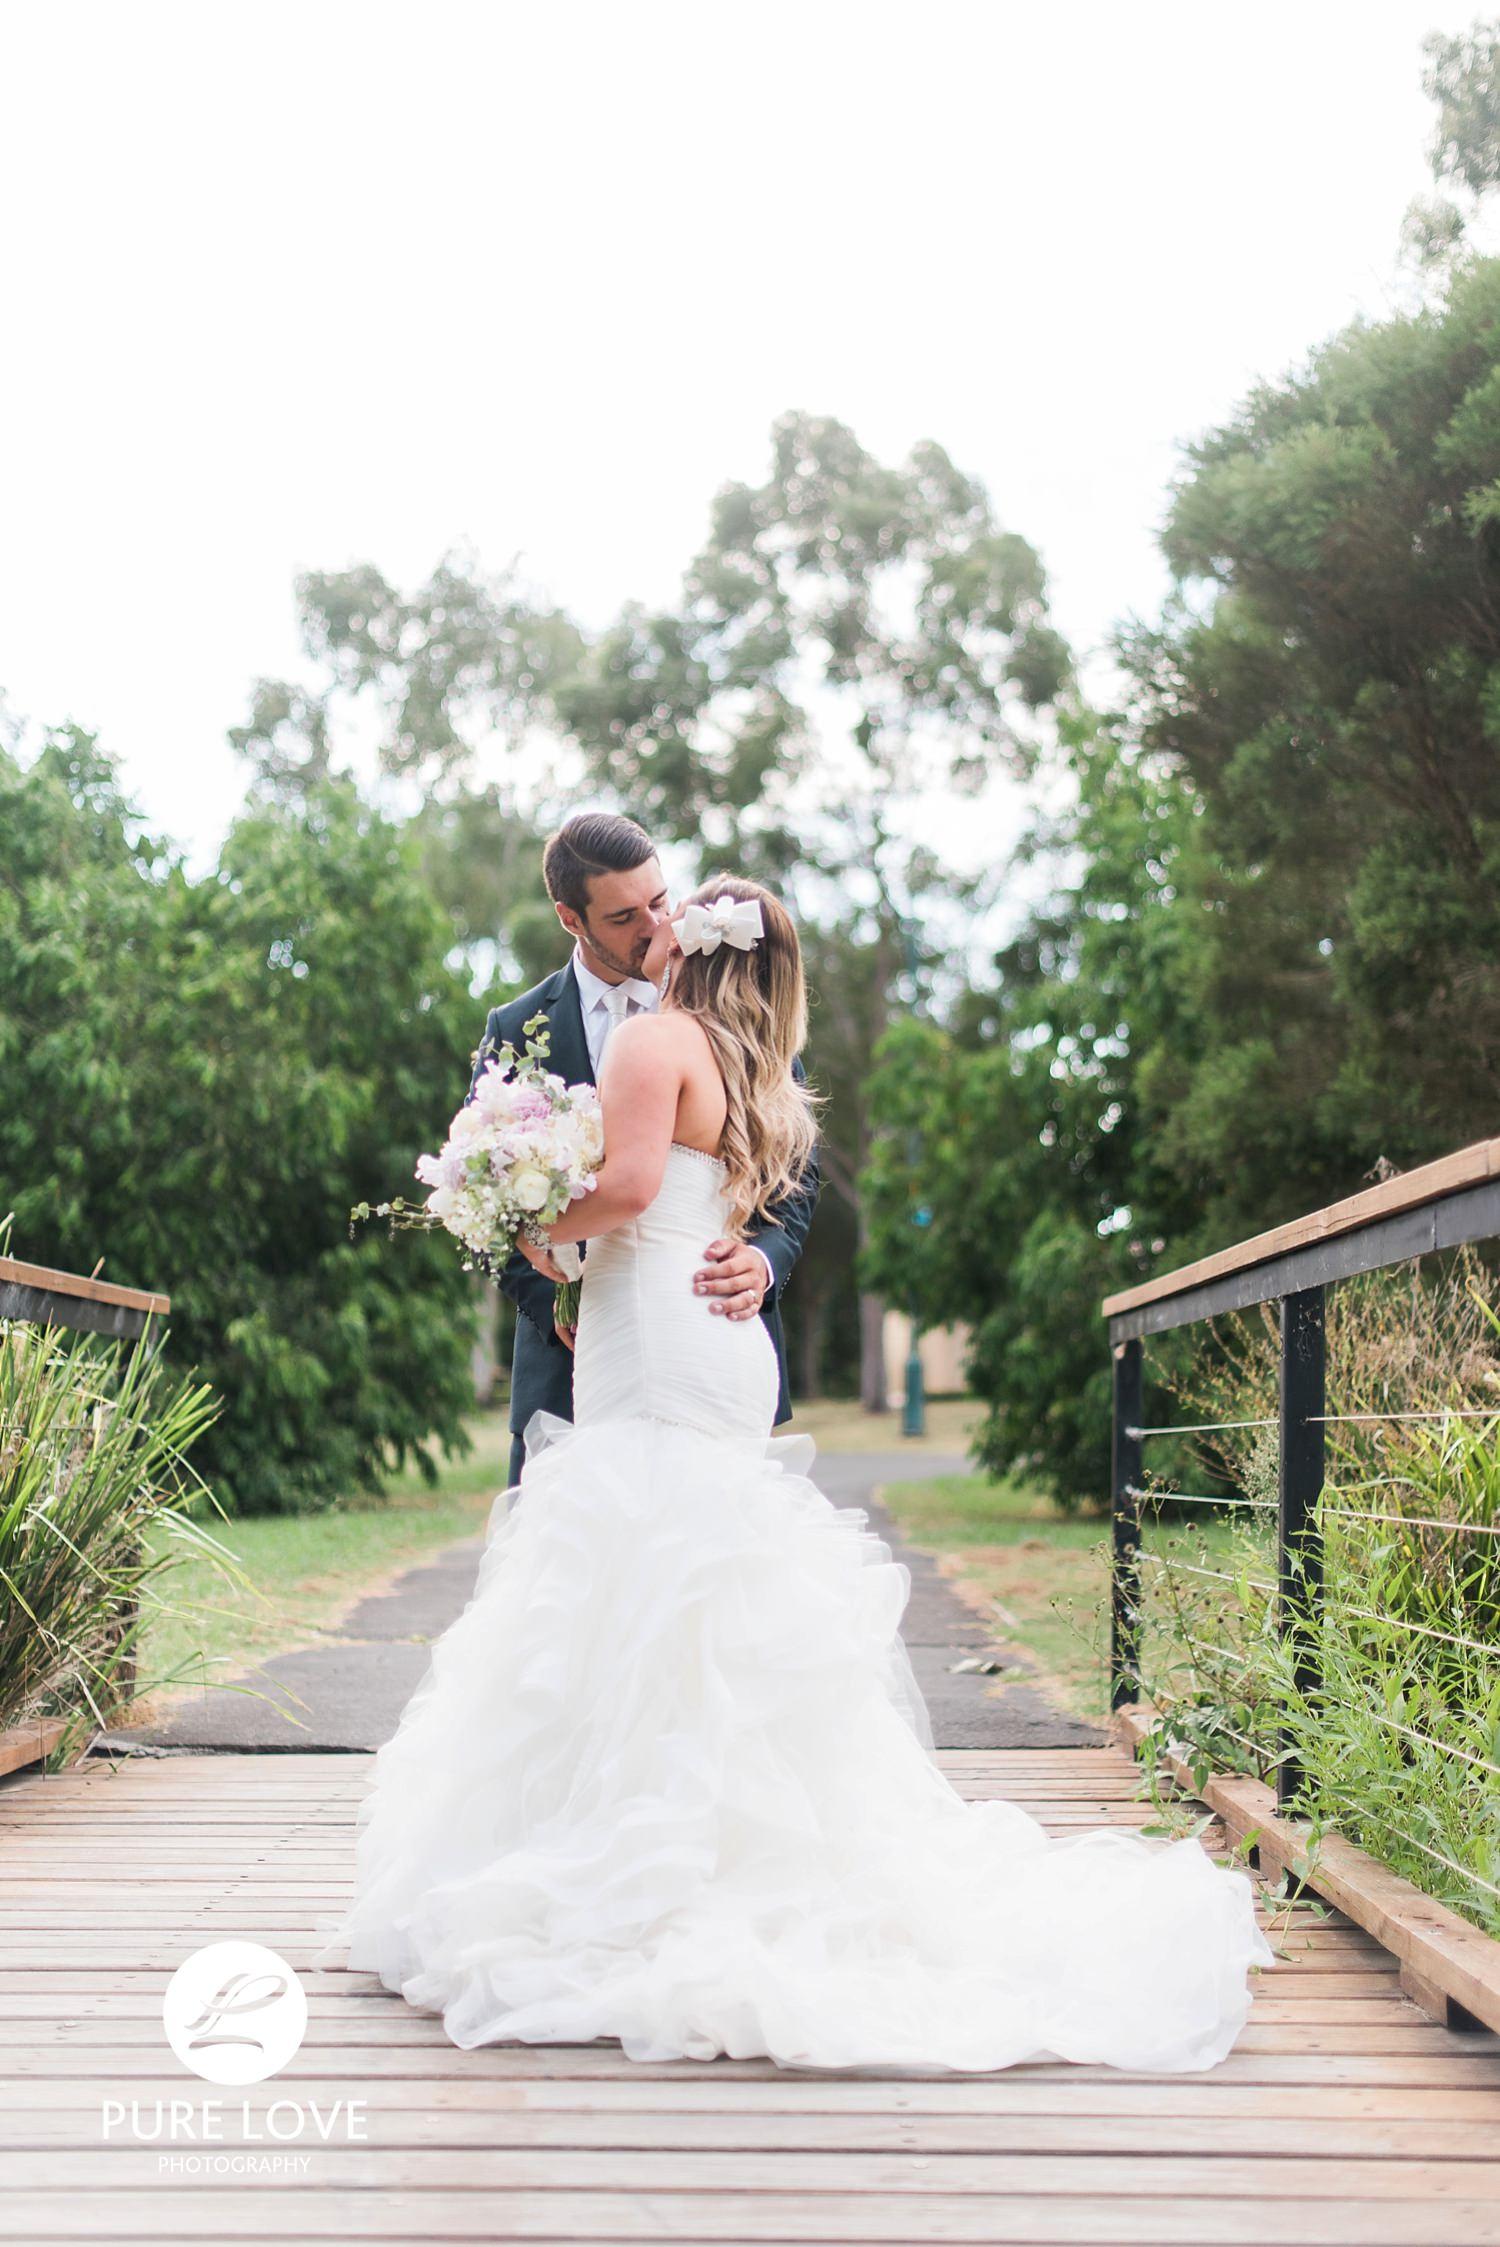 wedding photo kiss on the bridge